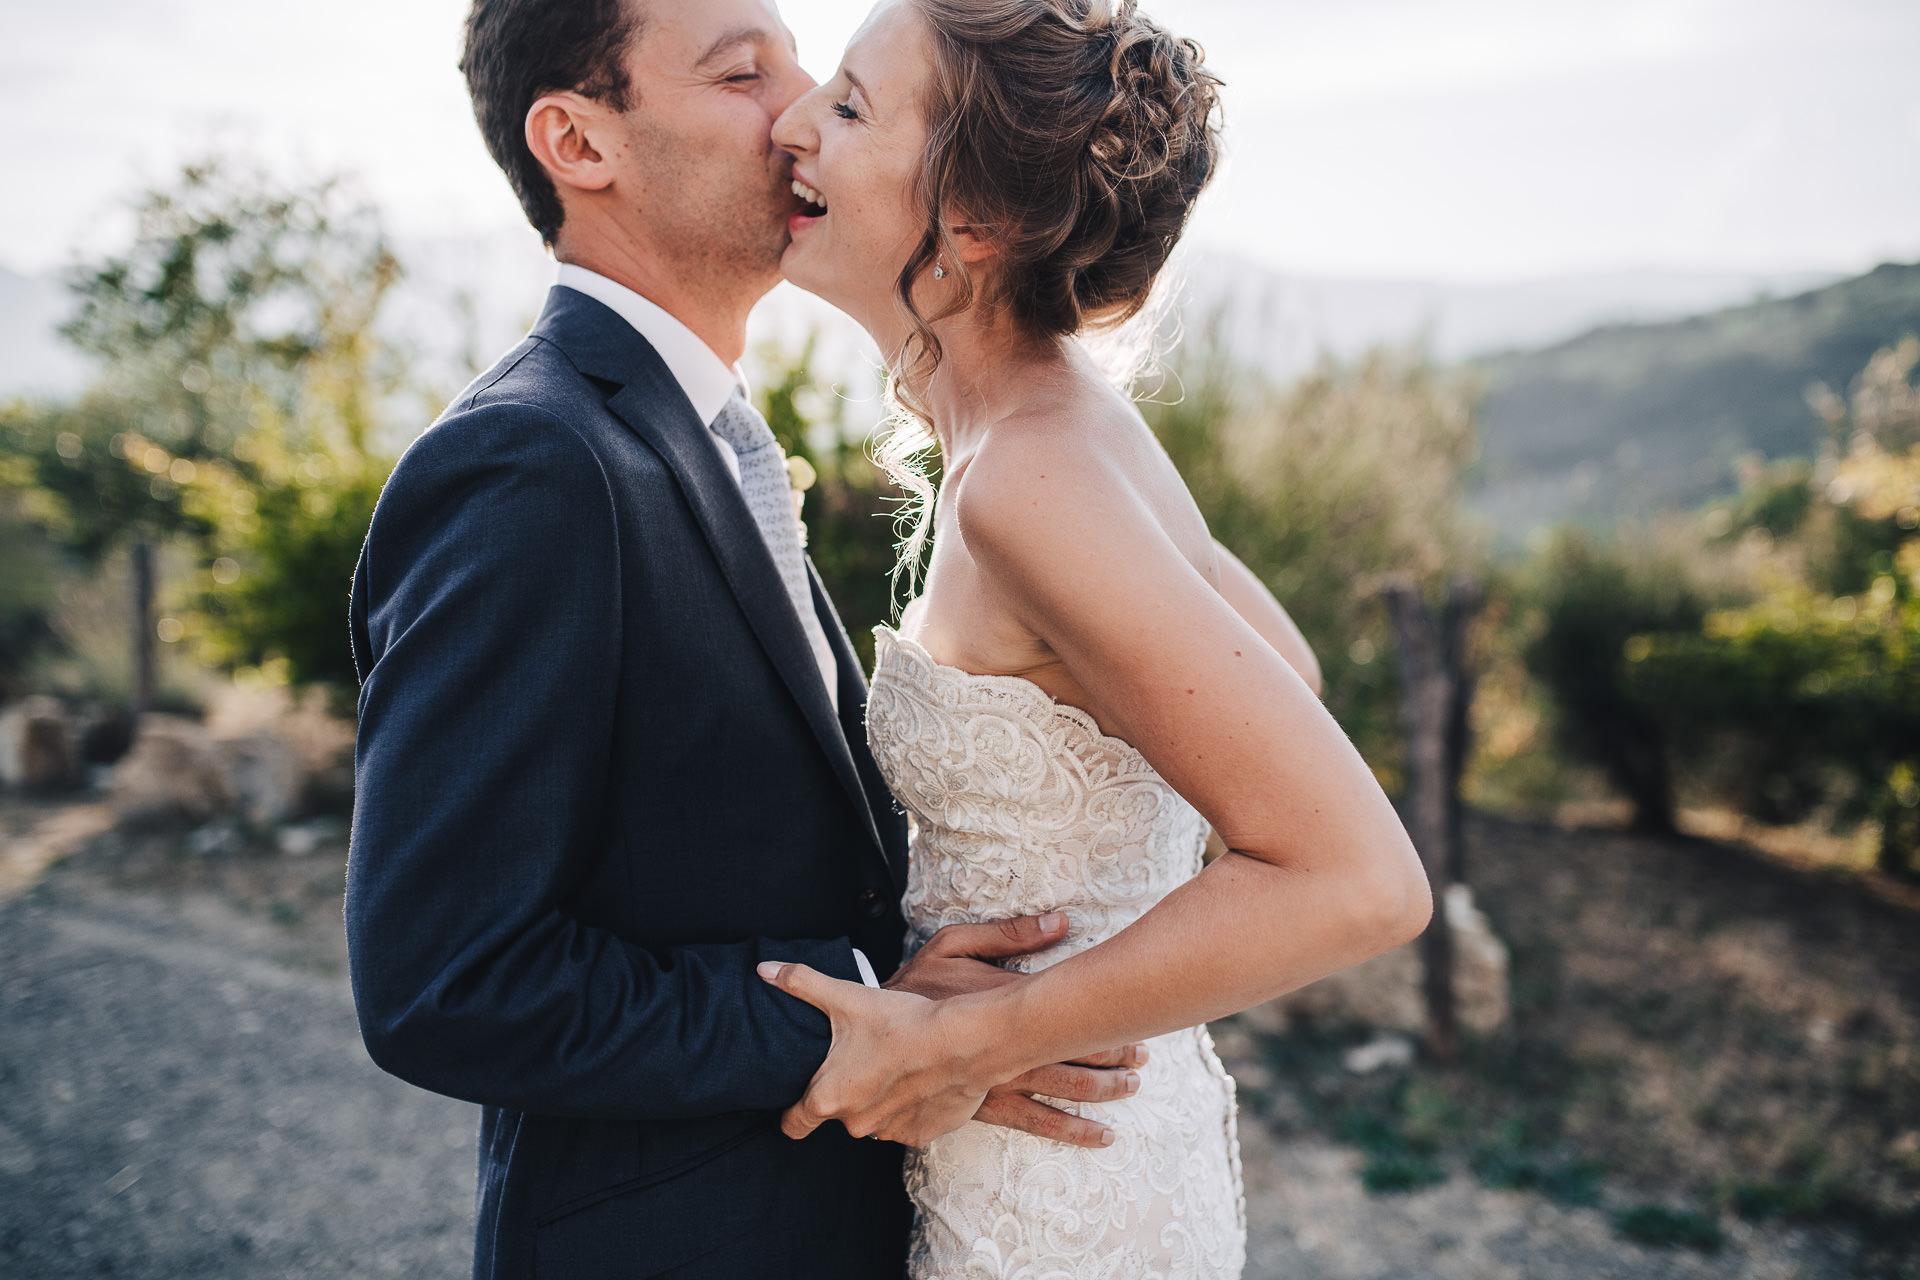 Matrimonio Nel Bosco Toscana : Matrimonio intimo in toscana u whitelife studio